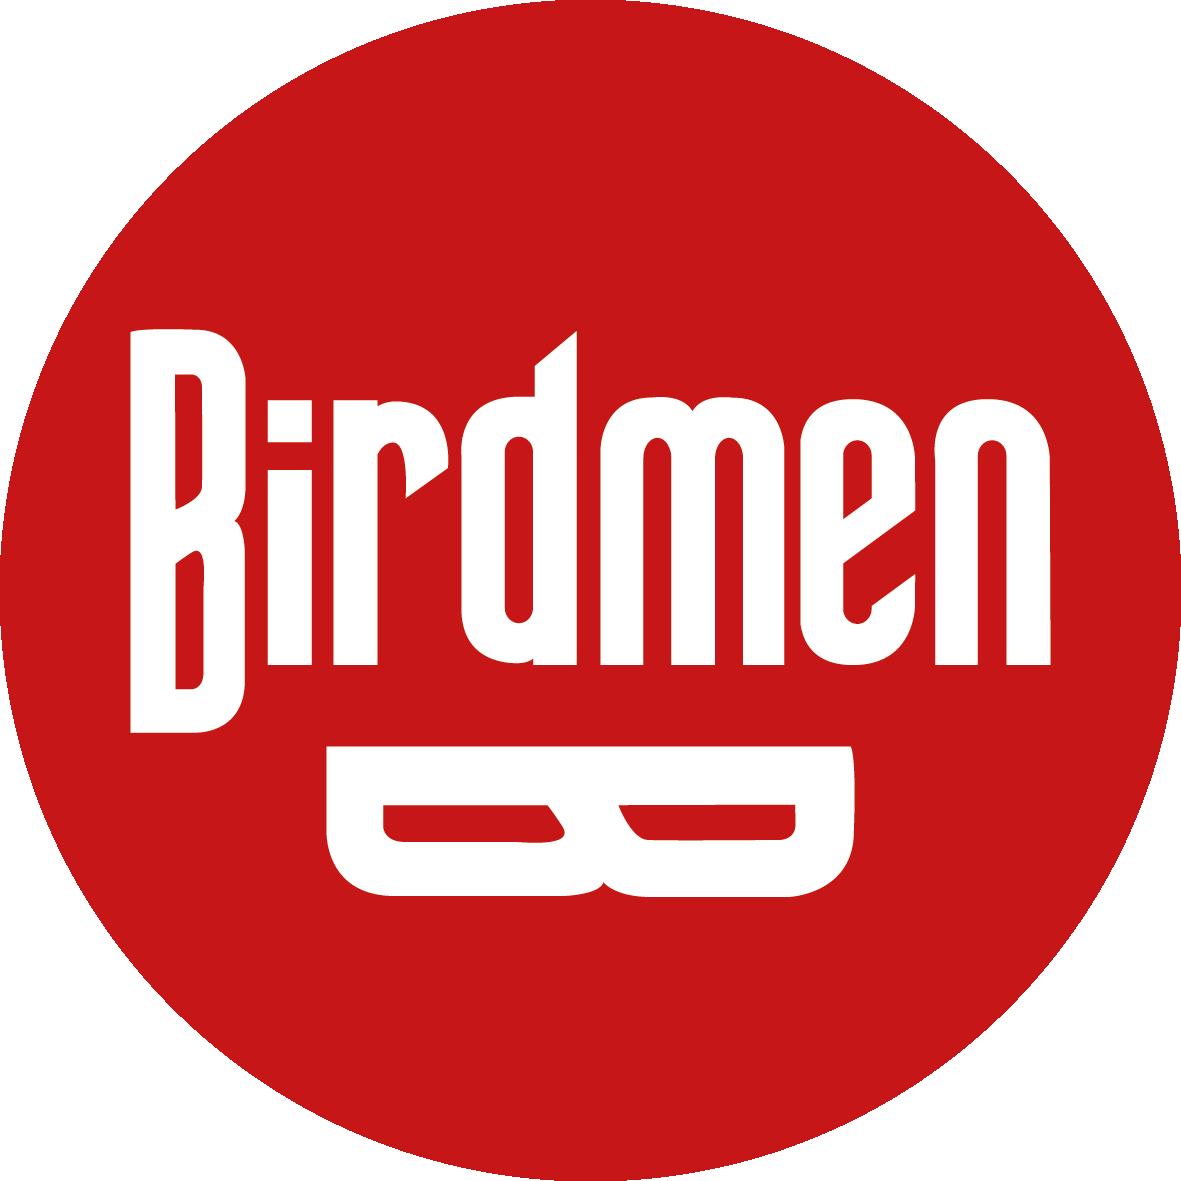 Birdmen logo cerchio nuovo